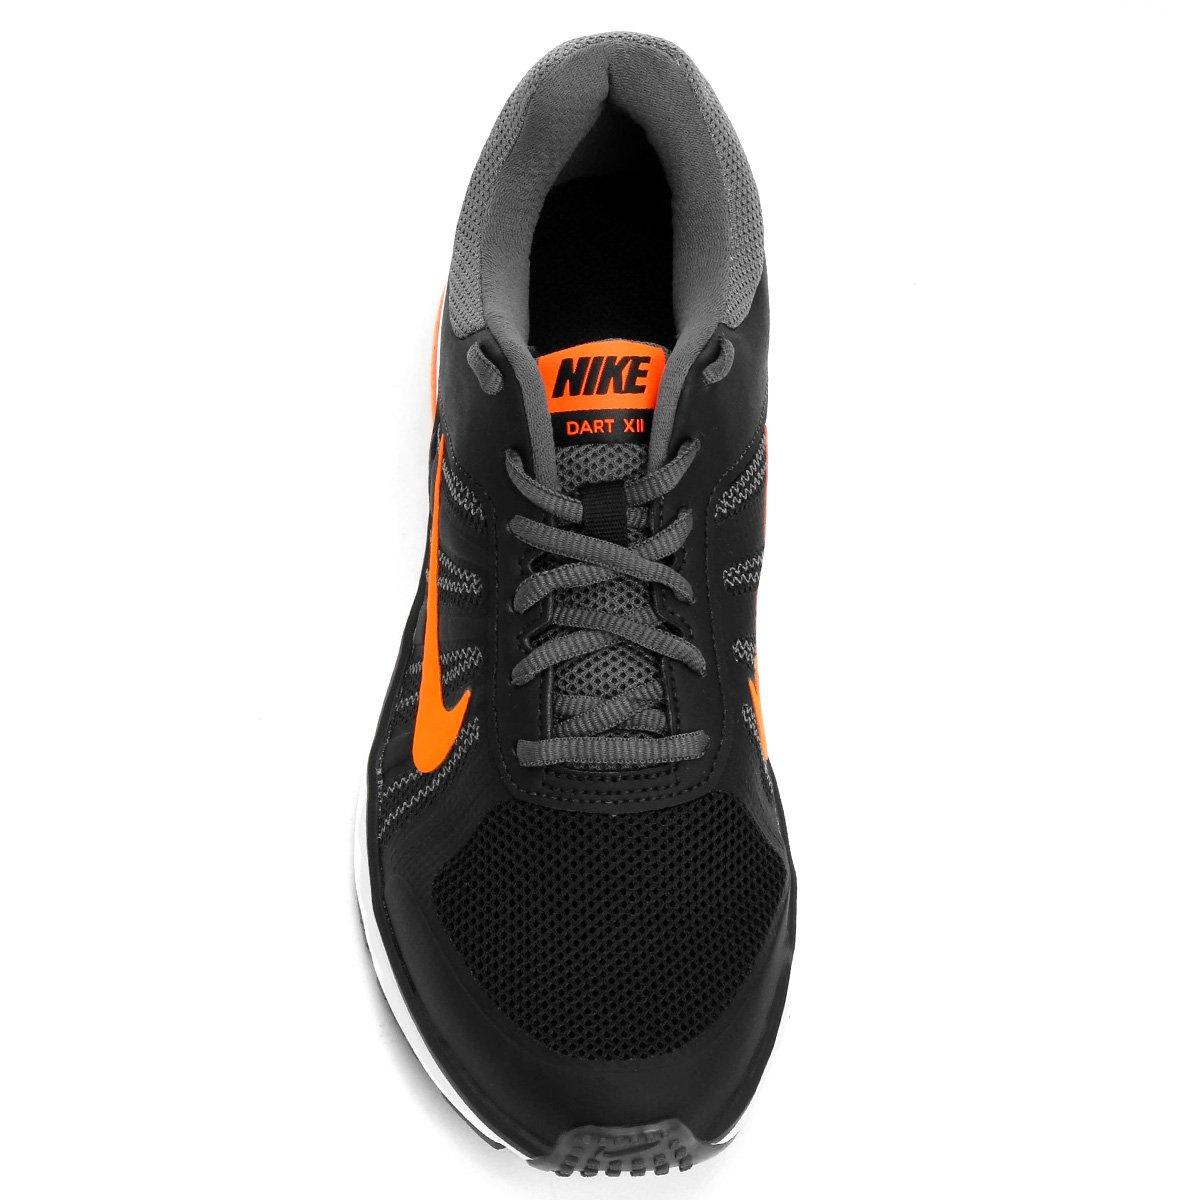 066b2ee895 Tênis Nike Dart 12 MSL Masculino - Preto e Laranja - Compre Agora ...